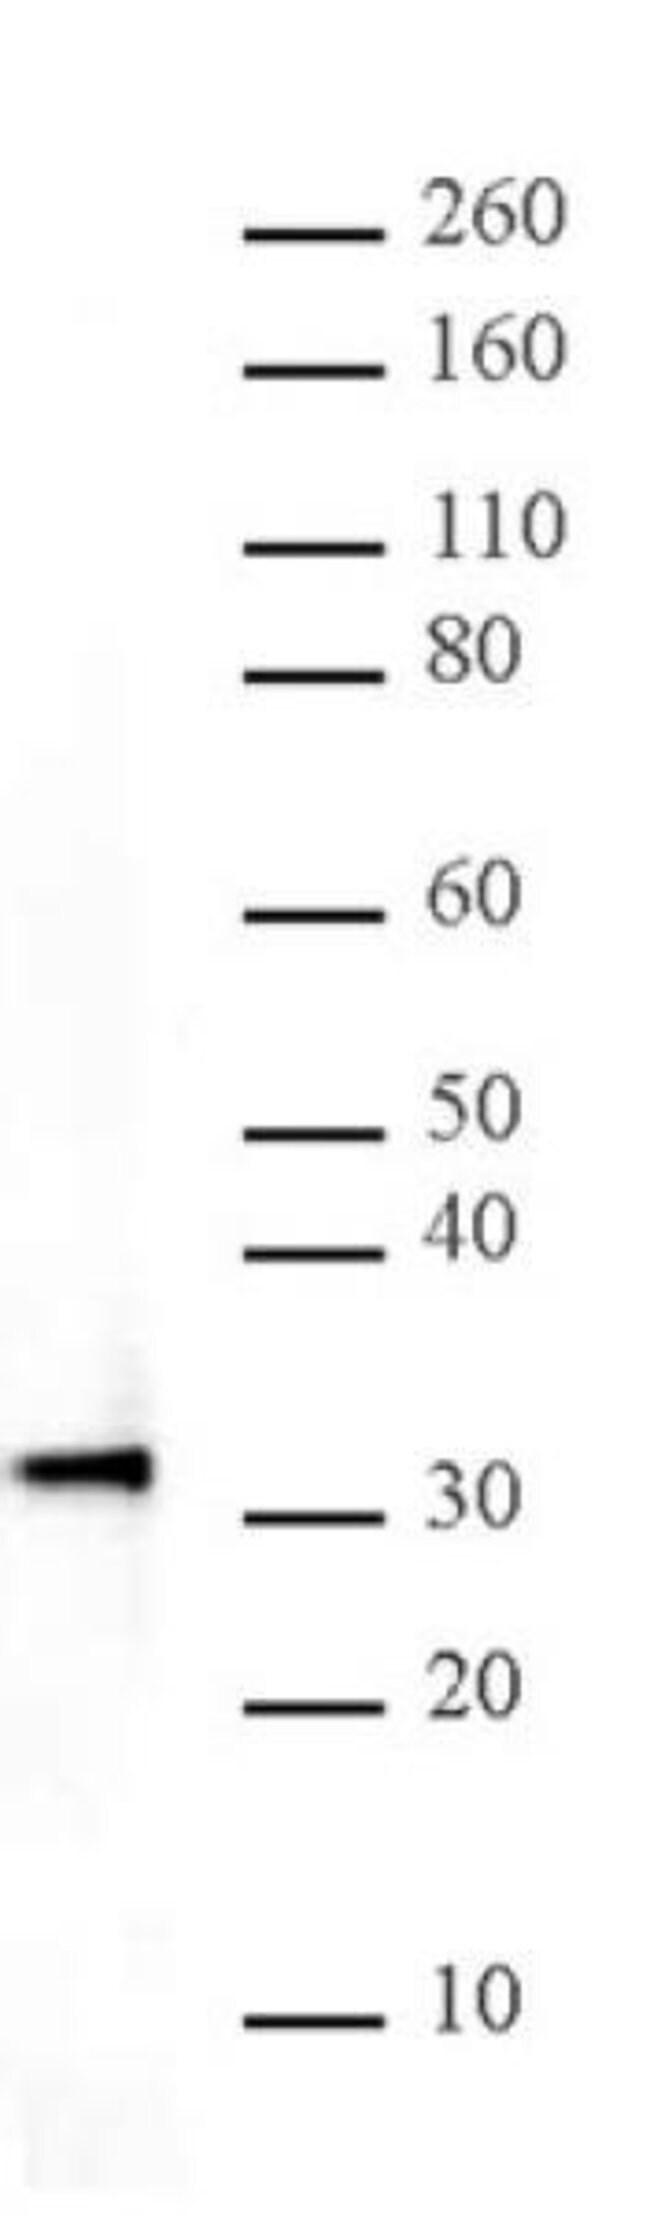 HMG-1 Rabbit anti-Human, Unconjugated, Polyclonal, Active Motif:Antibodies:Primary